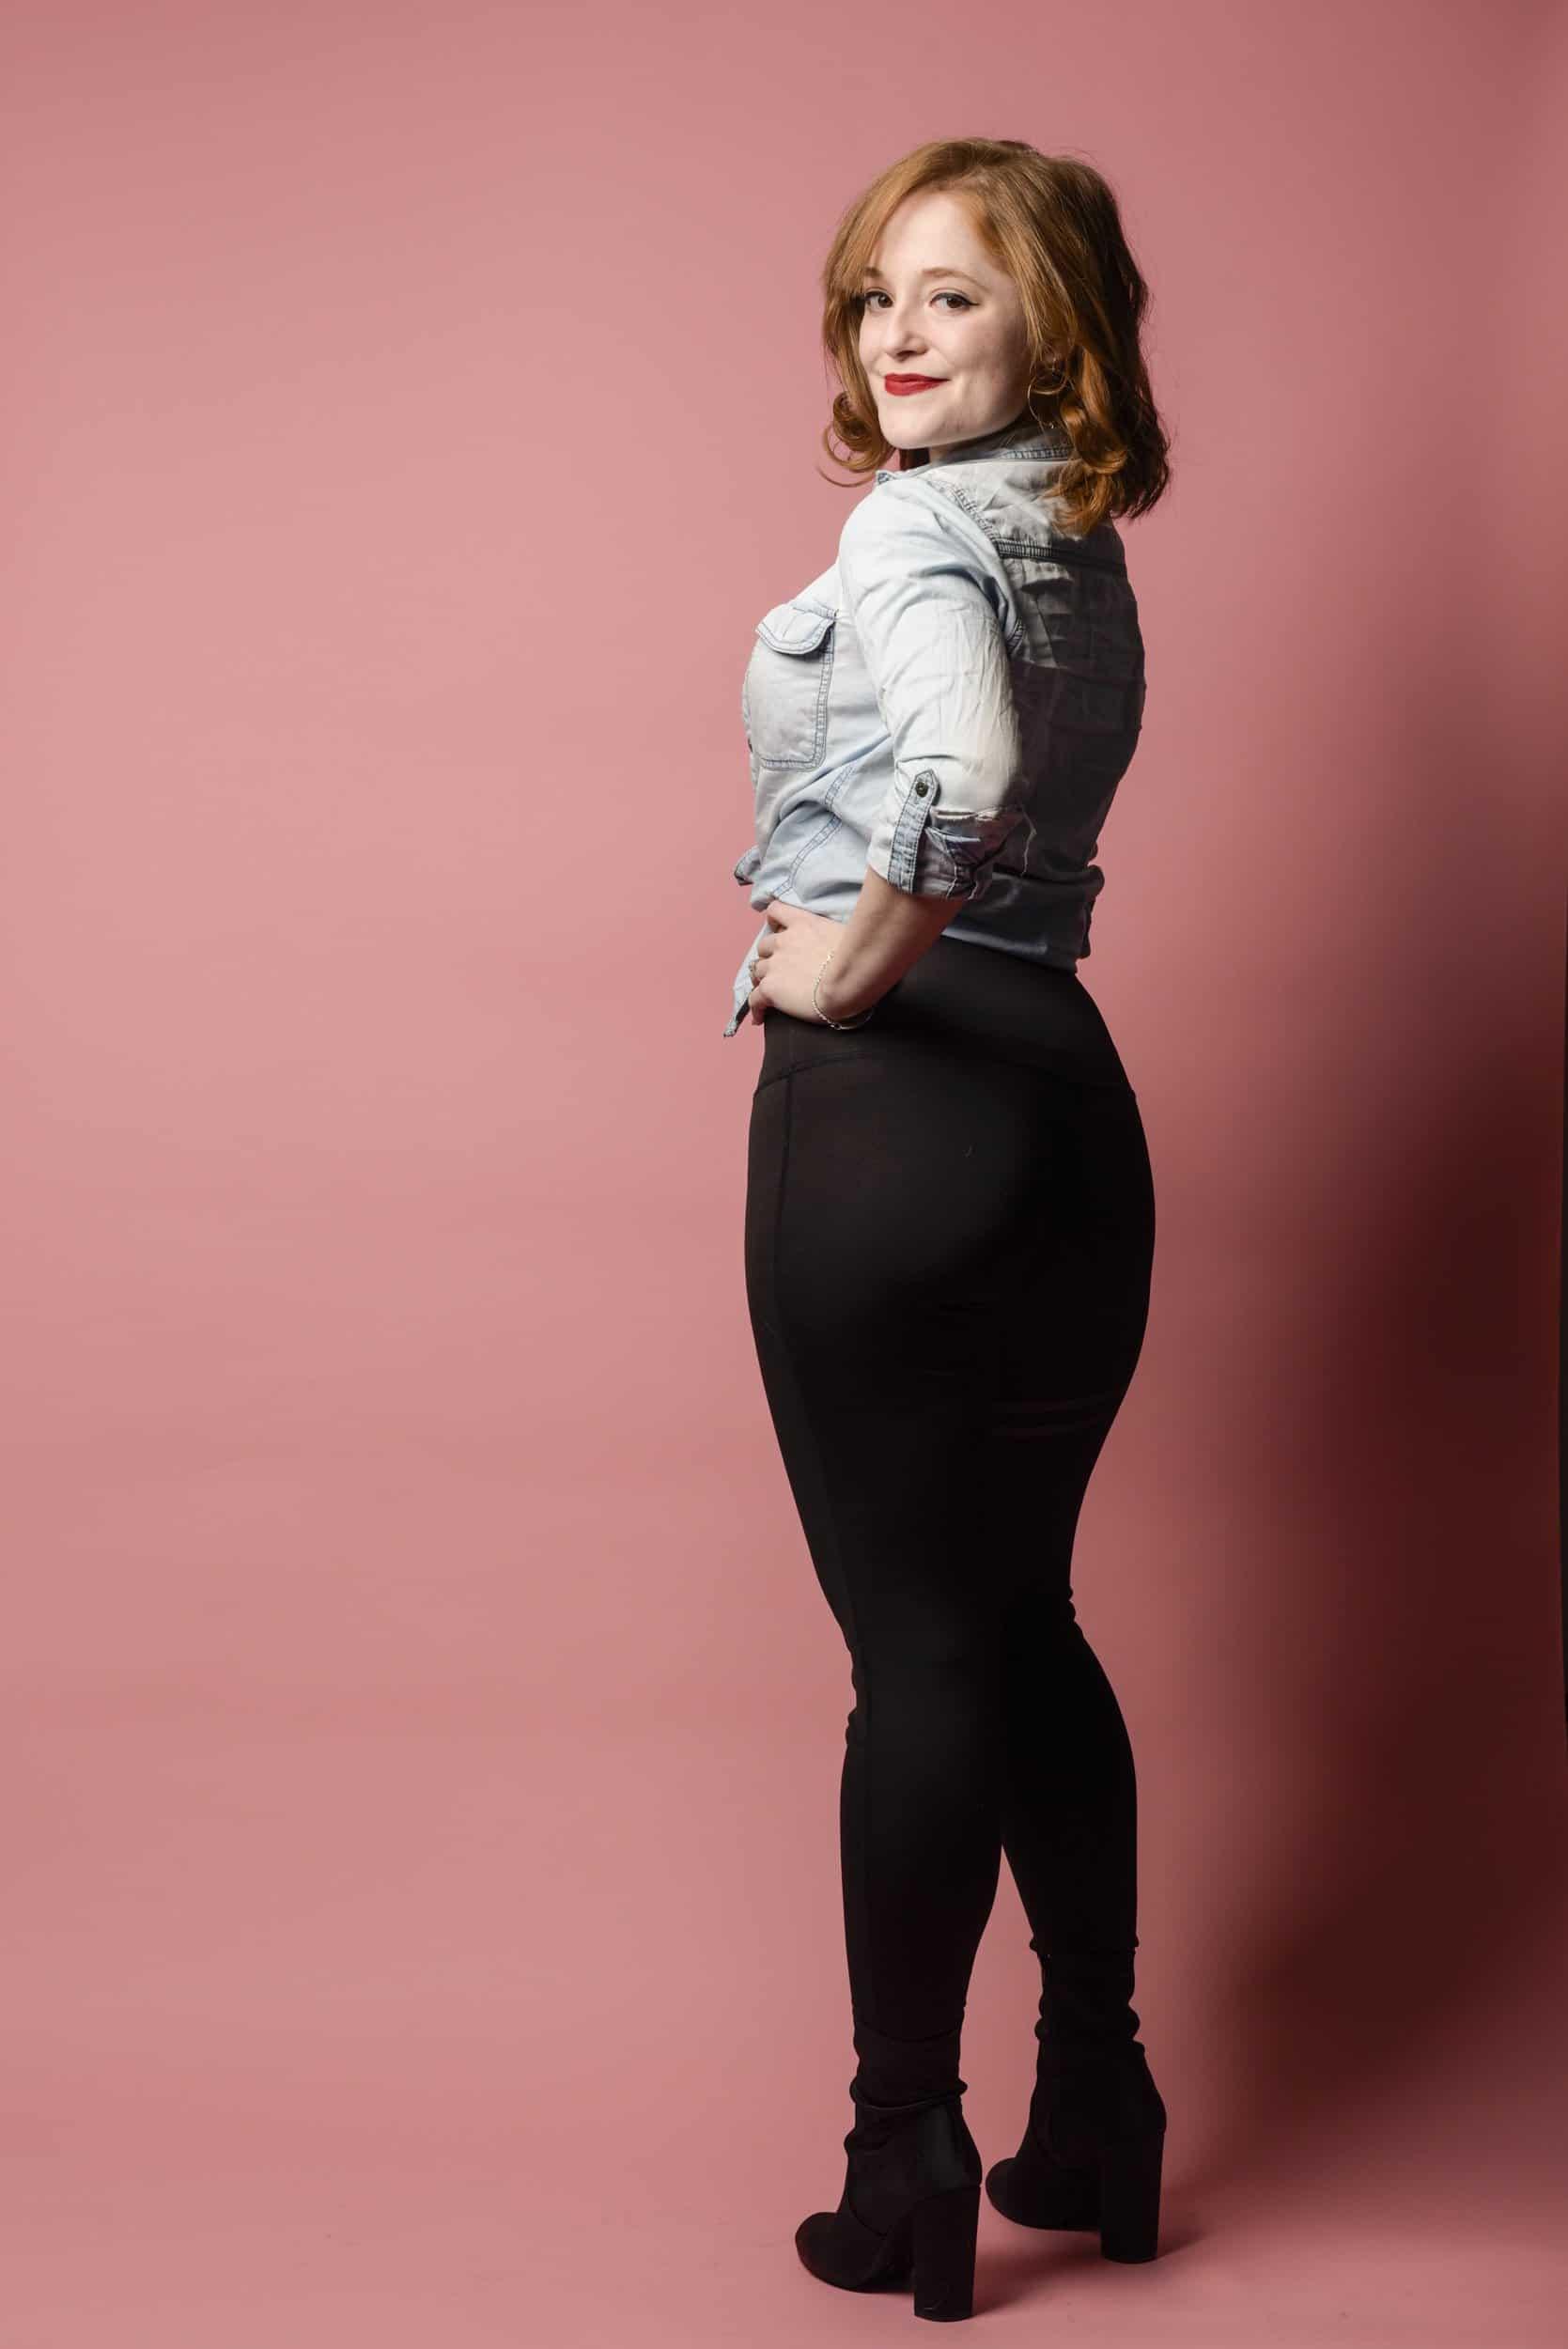 Marissa Caldwell